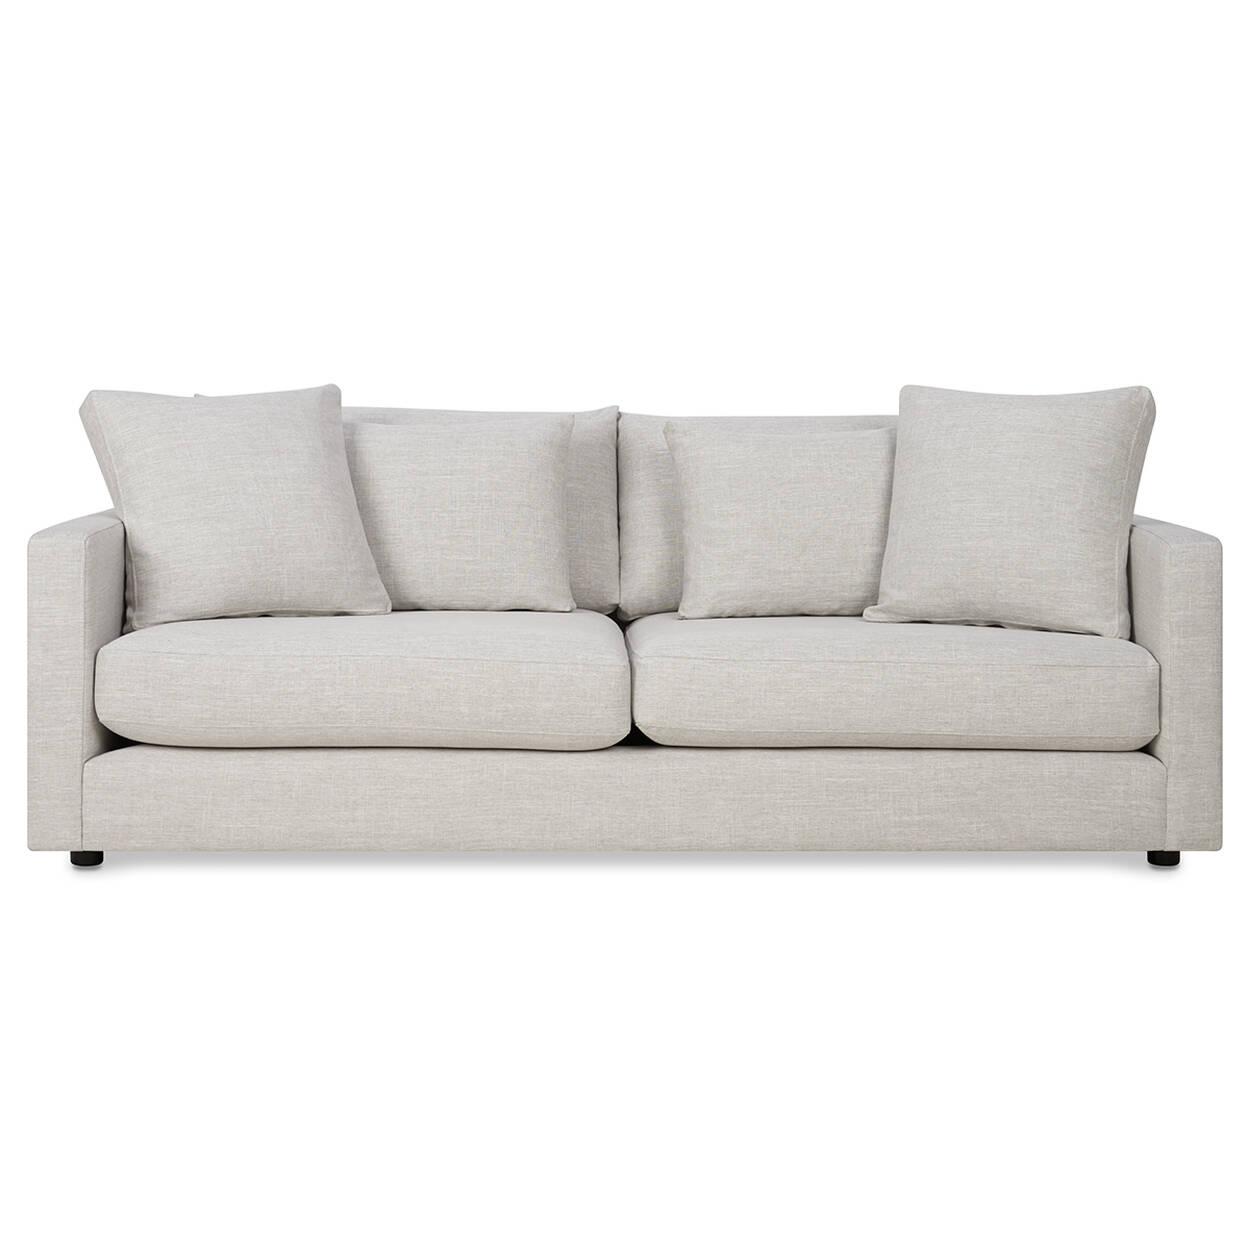 Admirable Berg Sofa Egyptian Dove Cjindustries Chair Design For Home Cjindustriesco